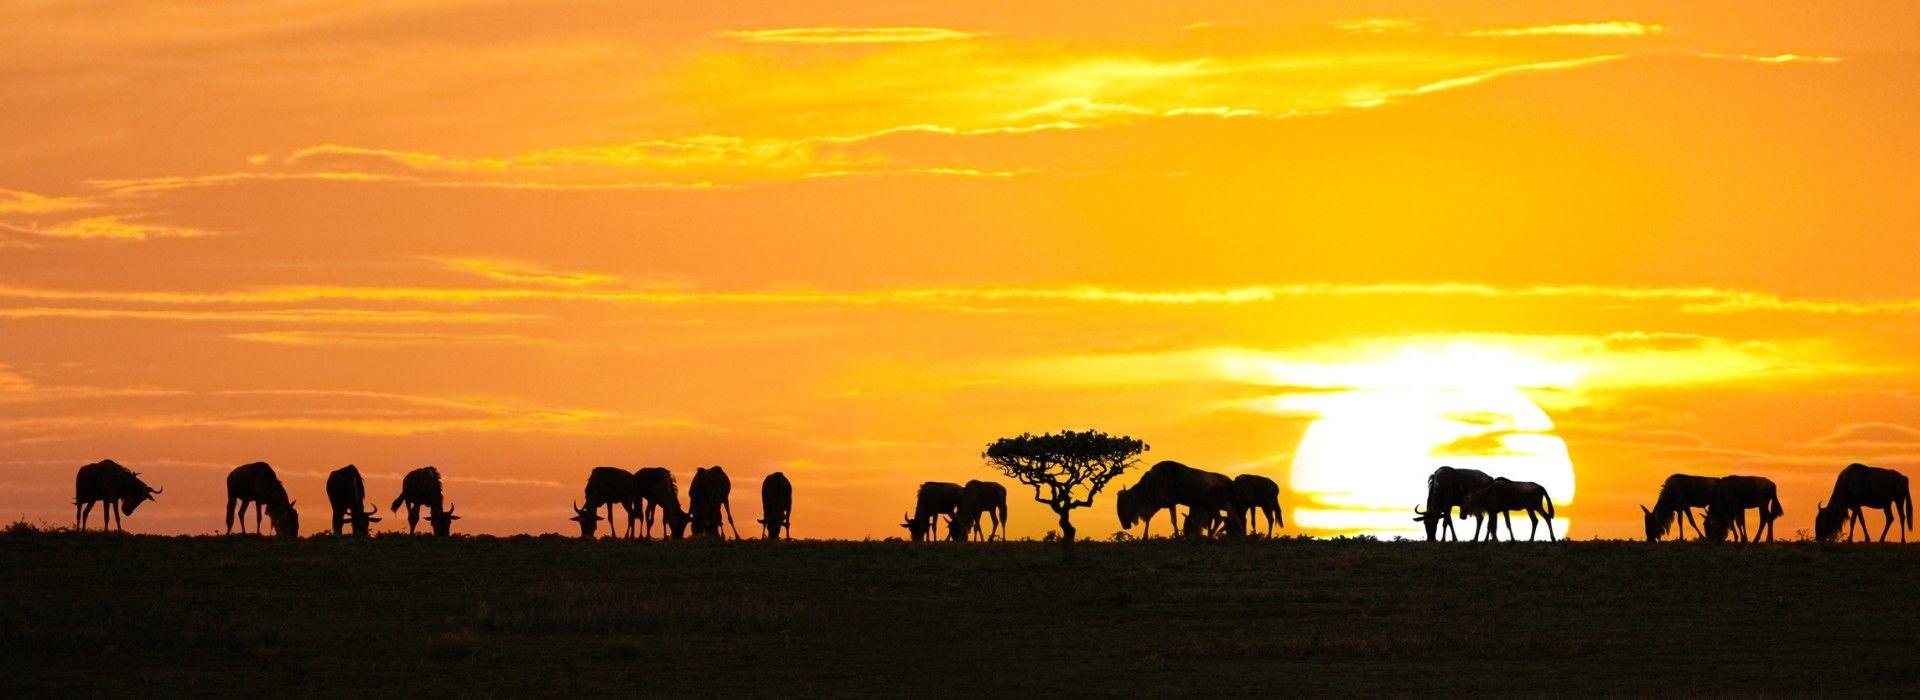 Wildlife safaris and game drives Tours in Tanzania Safari Parks